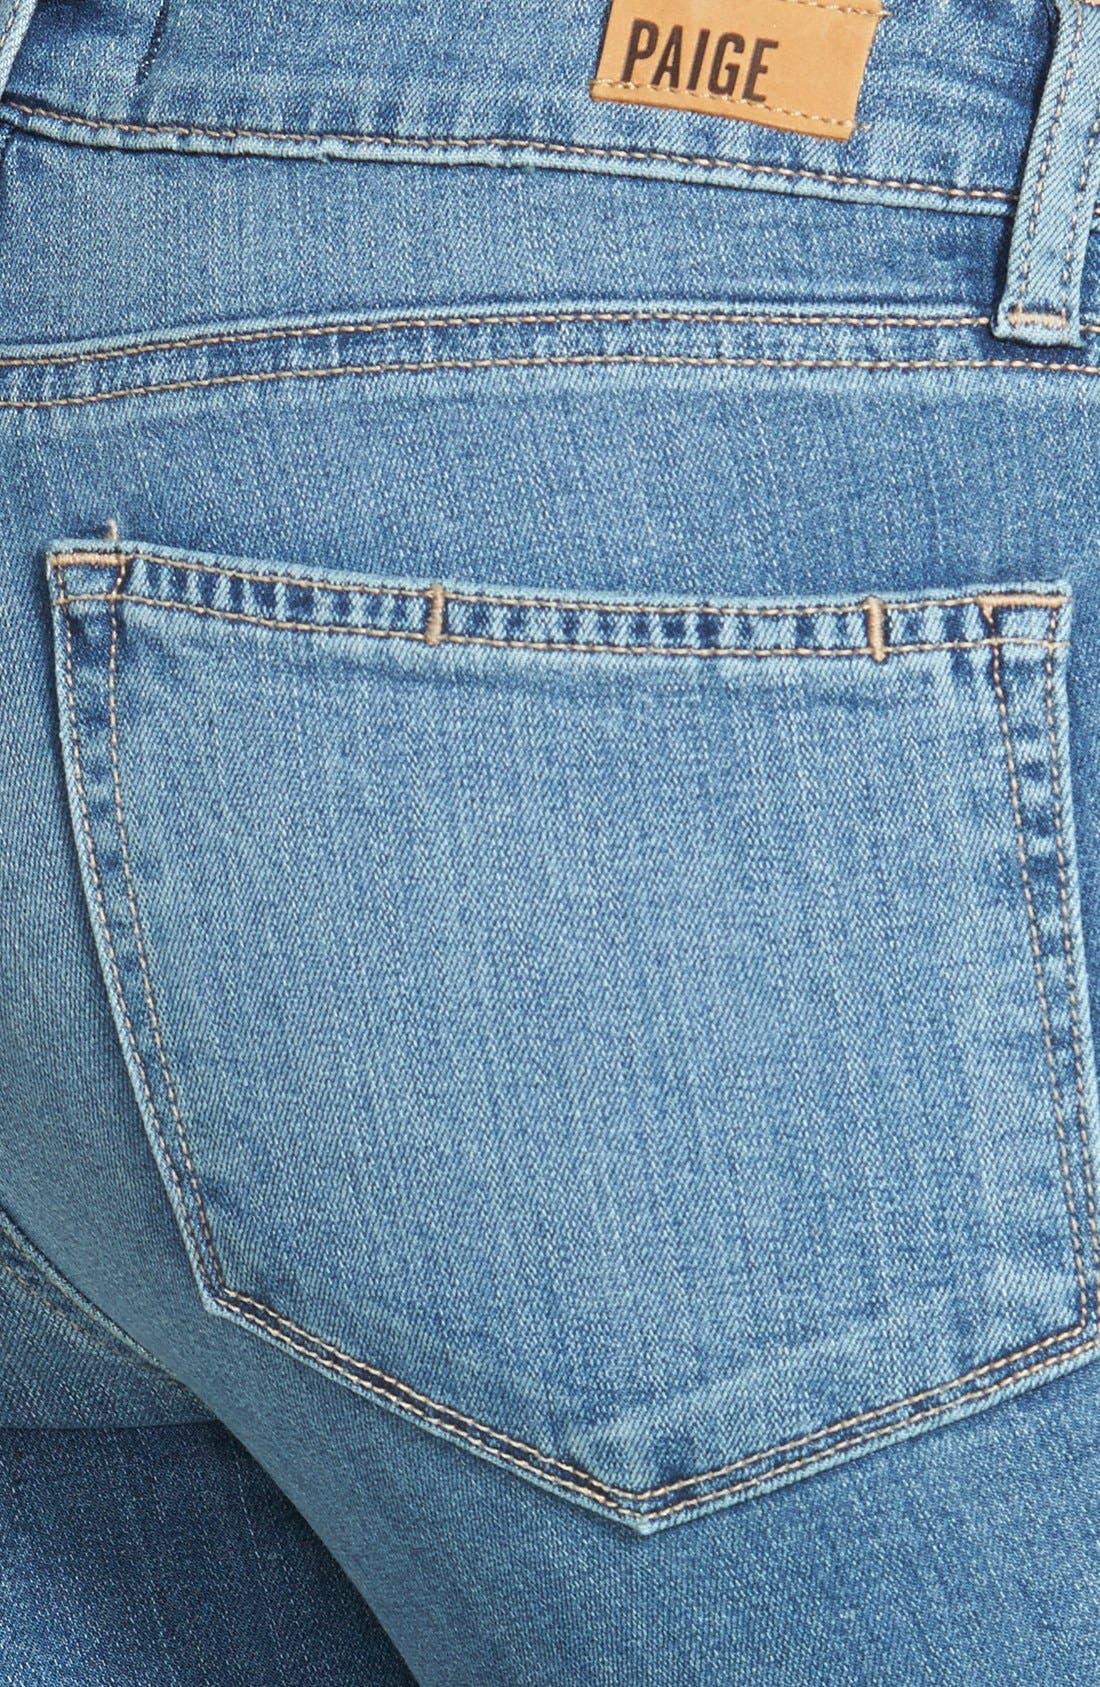 Alternate Image 3  - Paige Denim 'Verdugo' Ankle Skinny Jeans (Tegan)